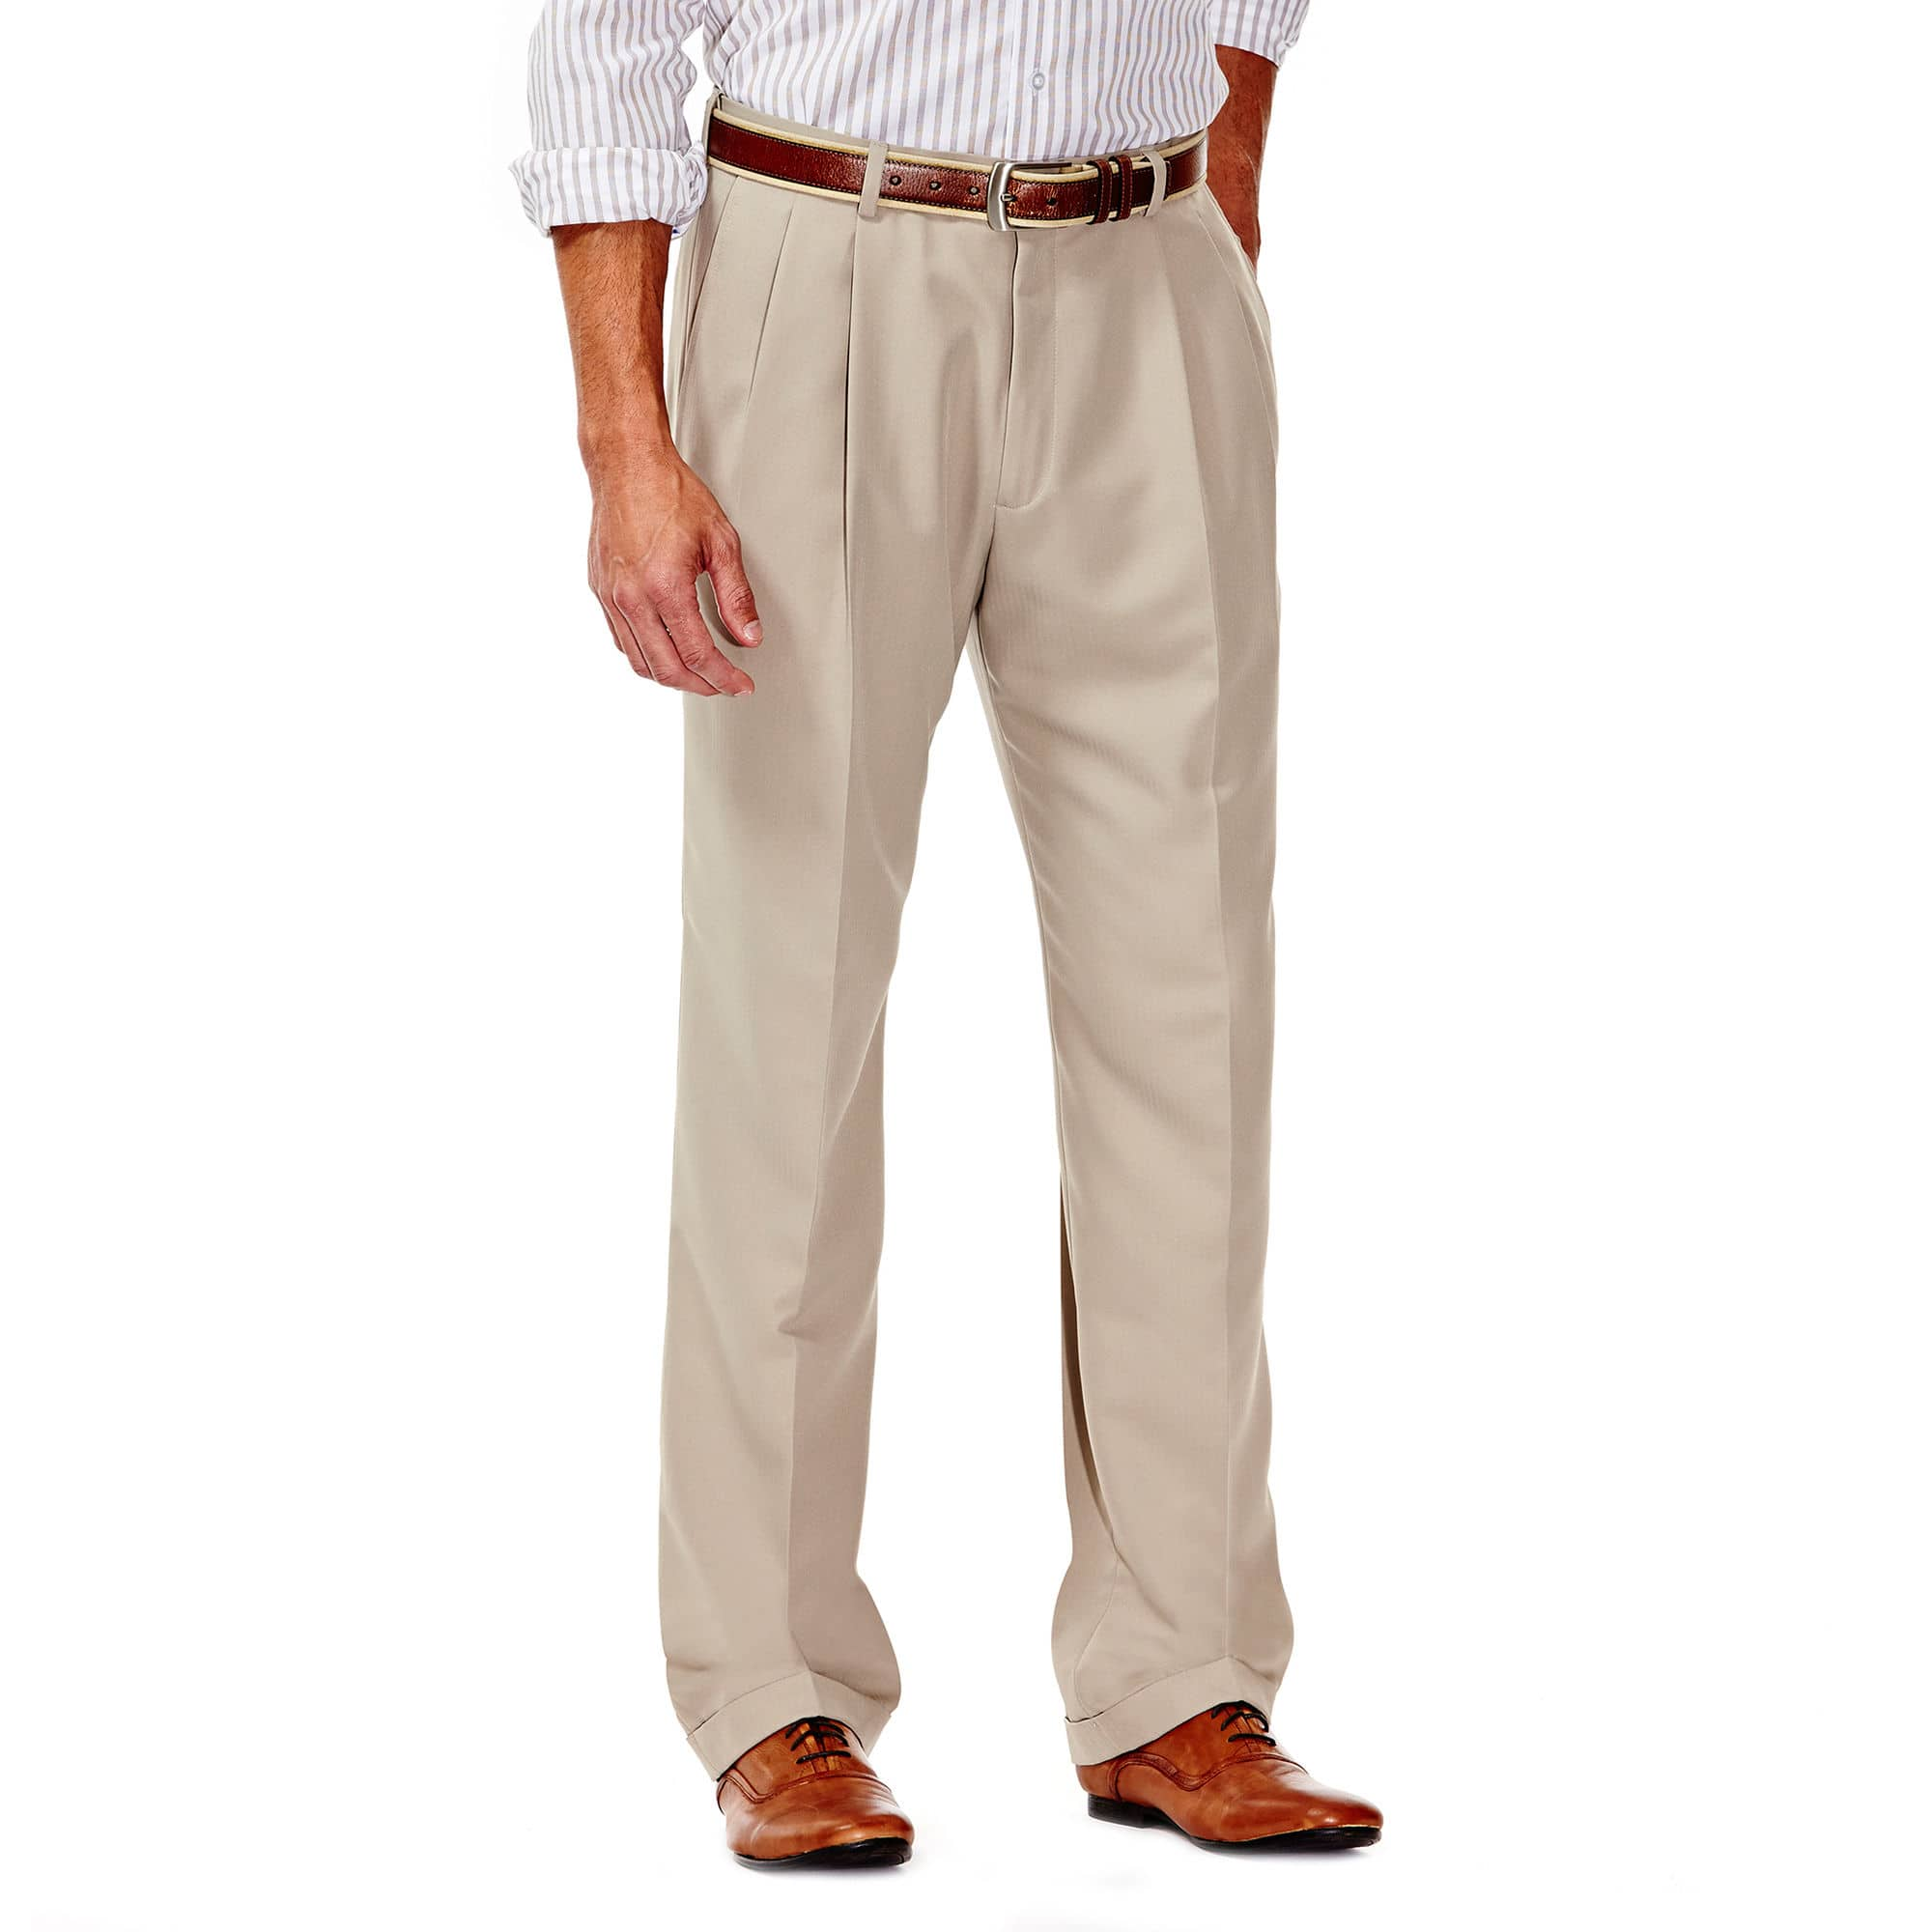 eba8402fae Haggar Men's Expandable Waistband Pants (various styles ...